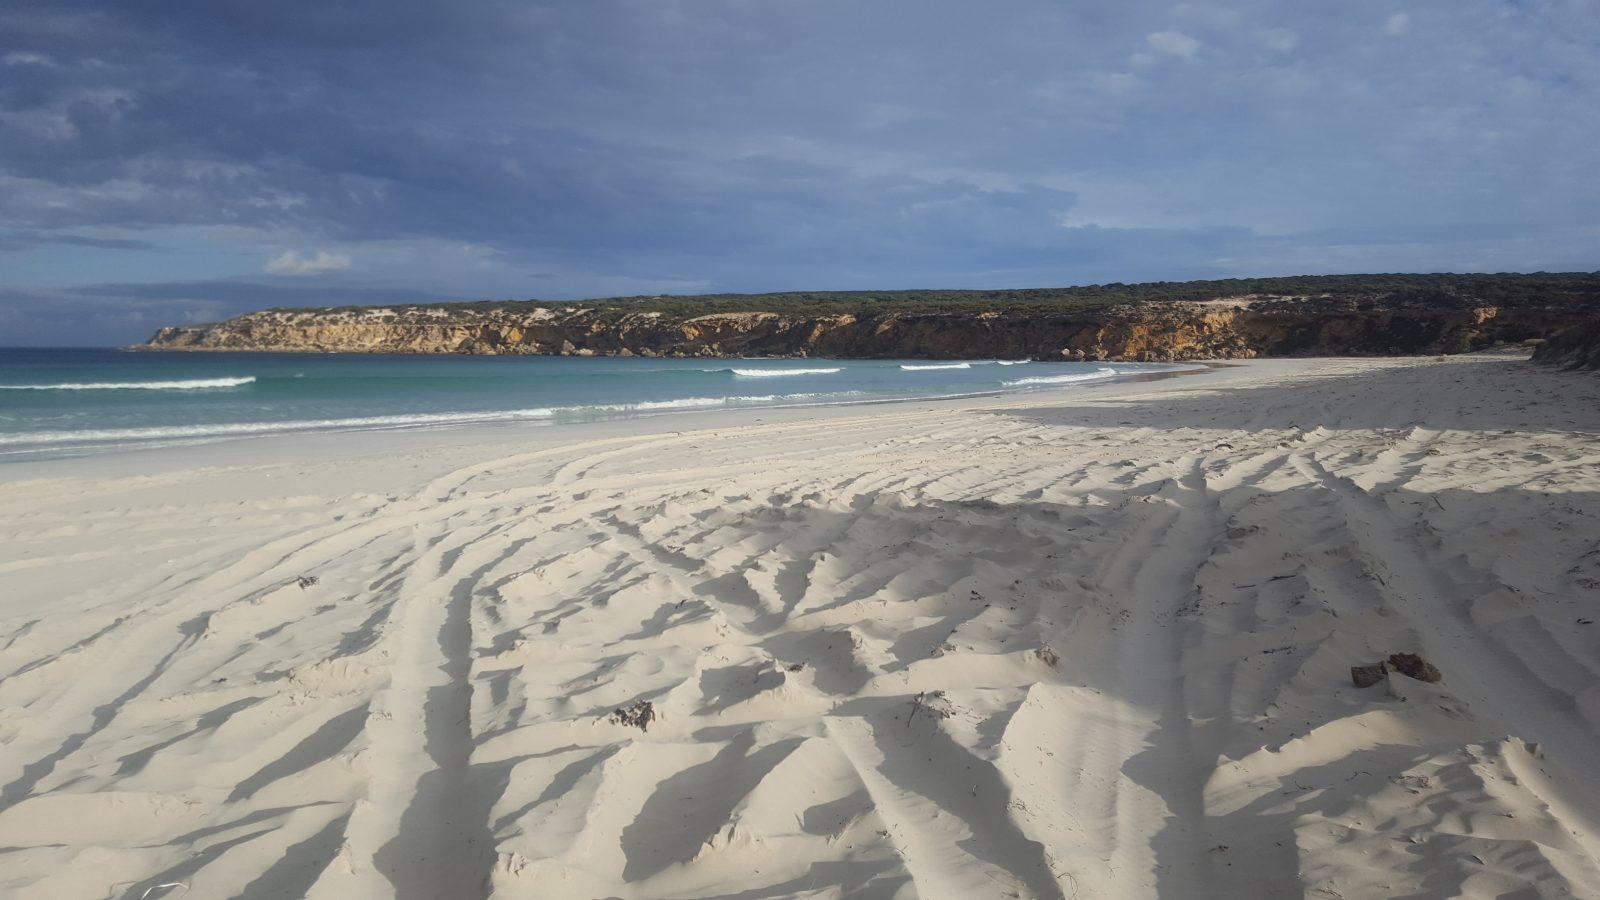 Plage Fishery Bay